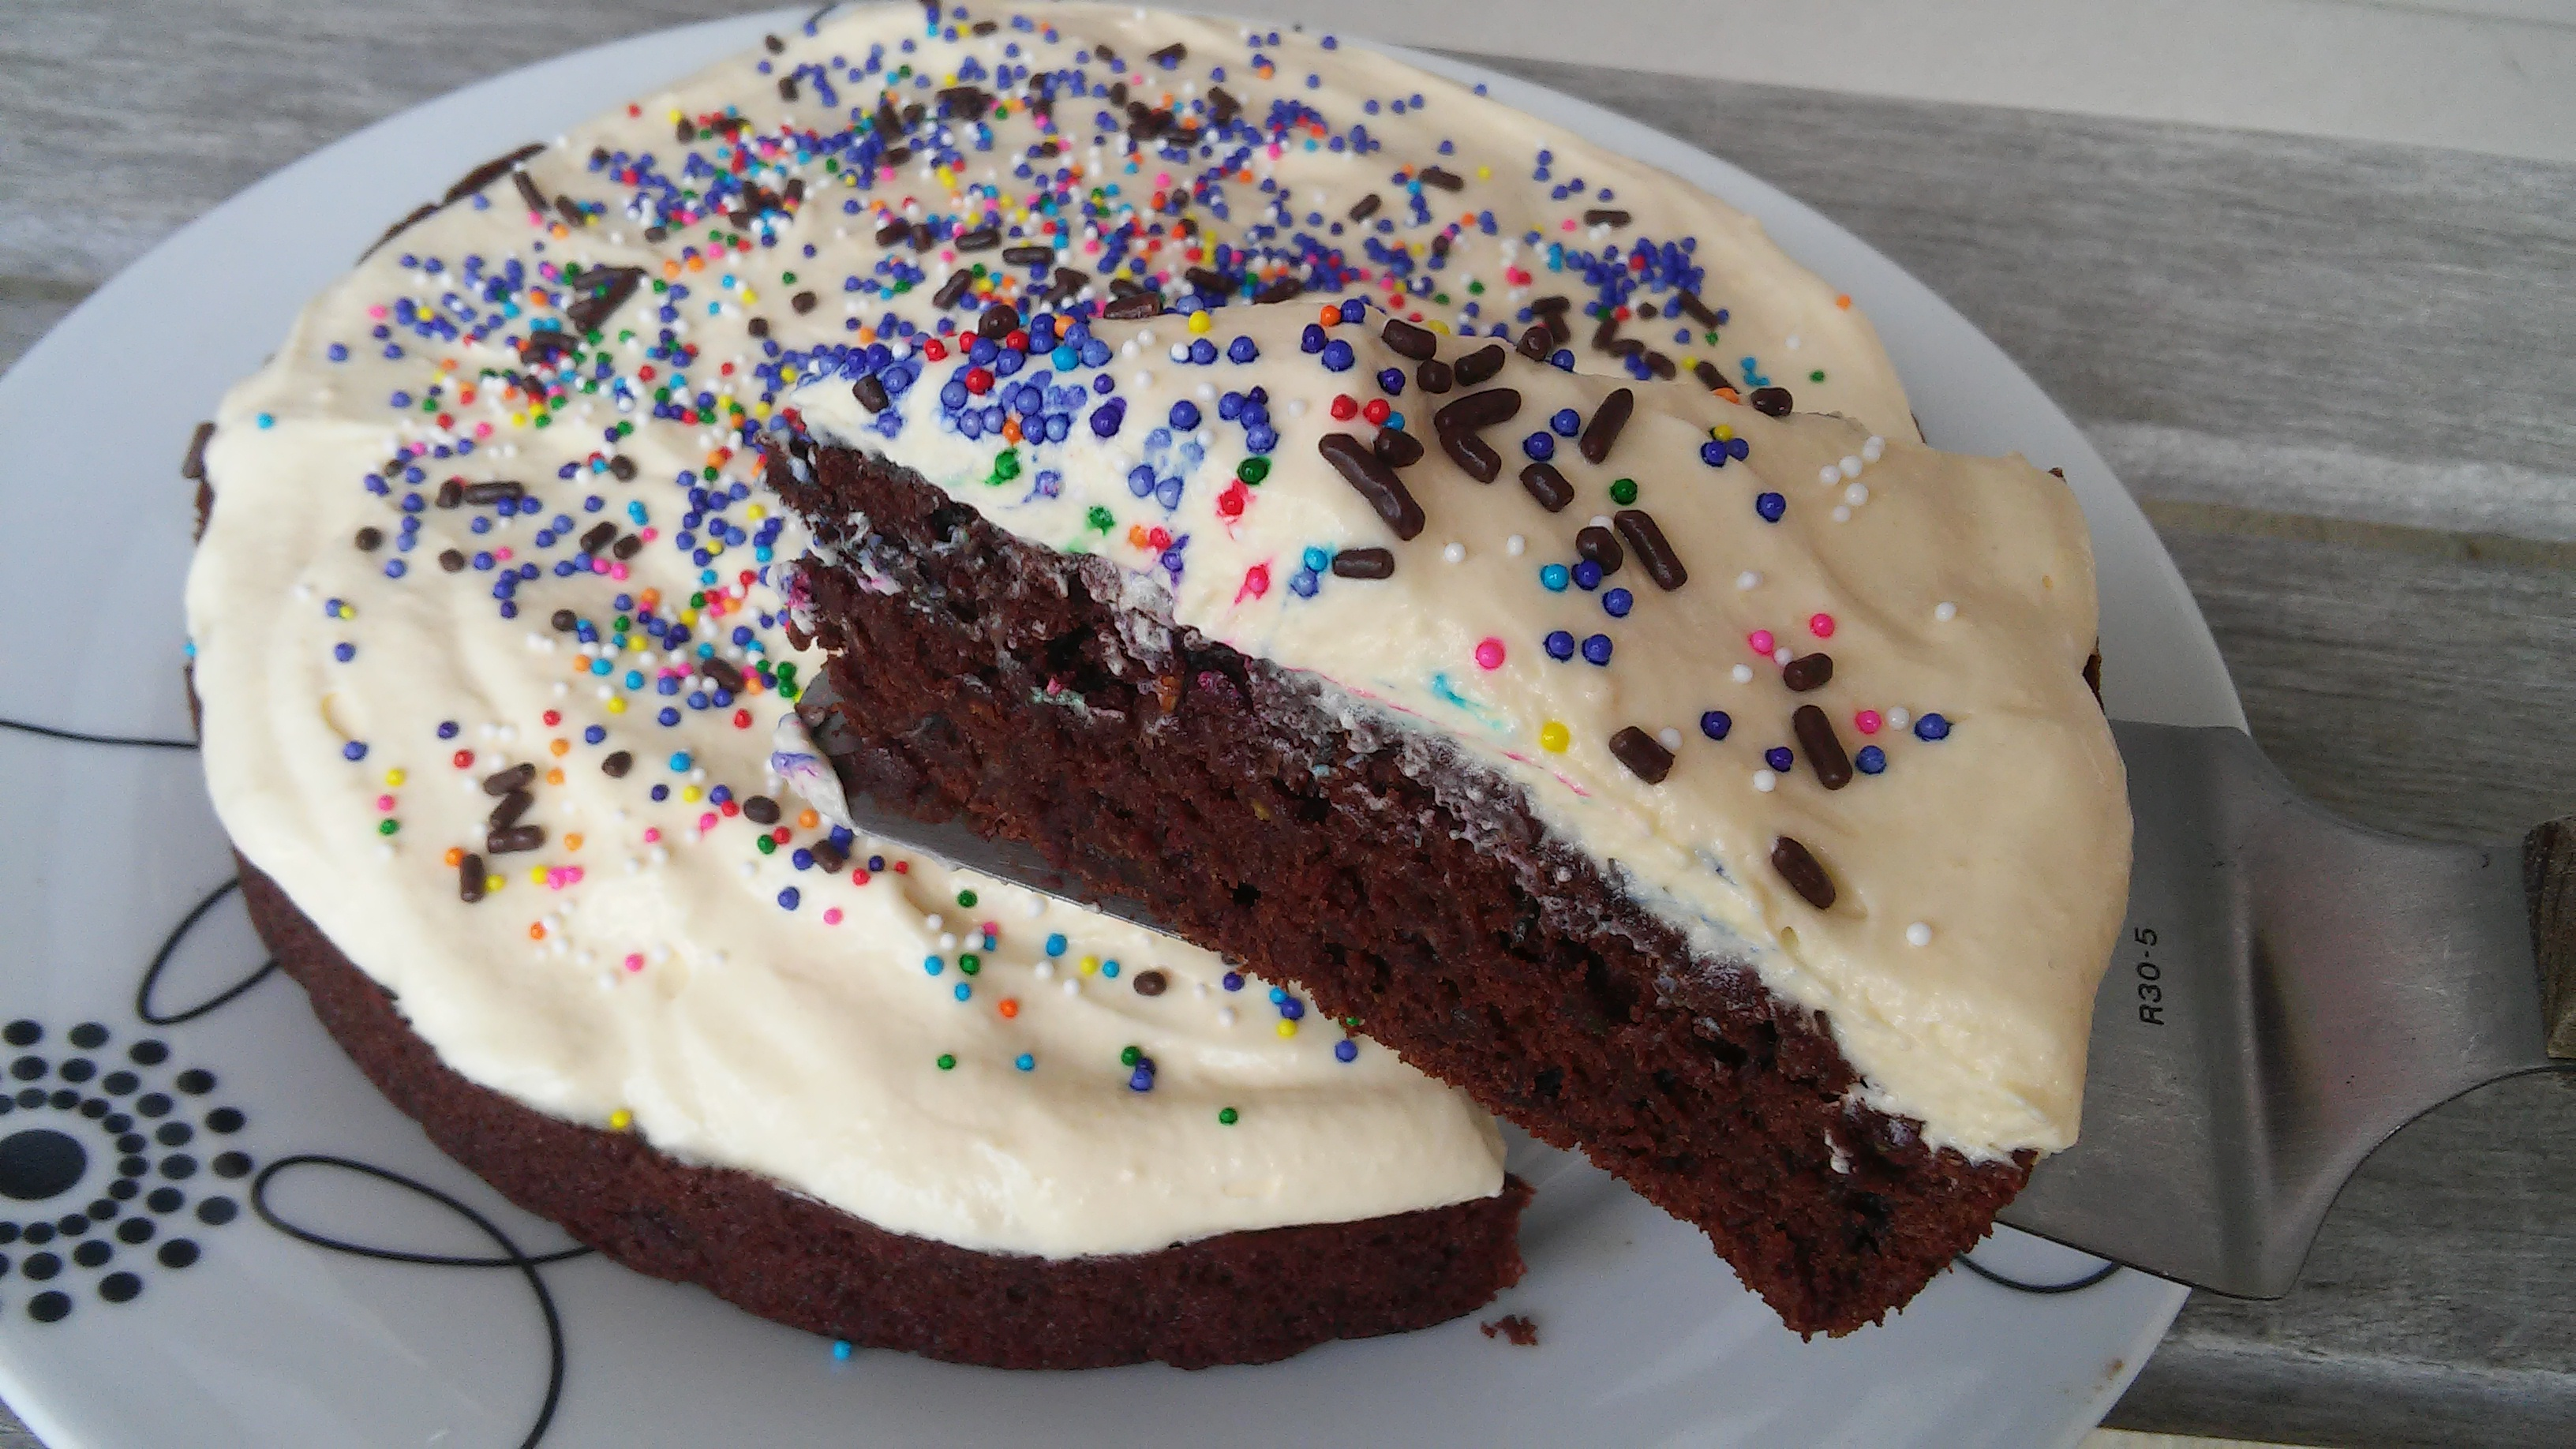 Healthy-ish Chocolate Cake